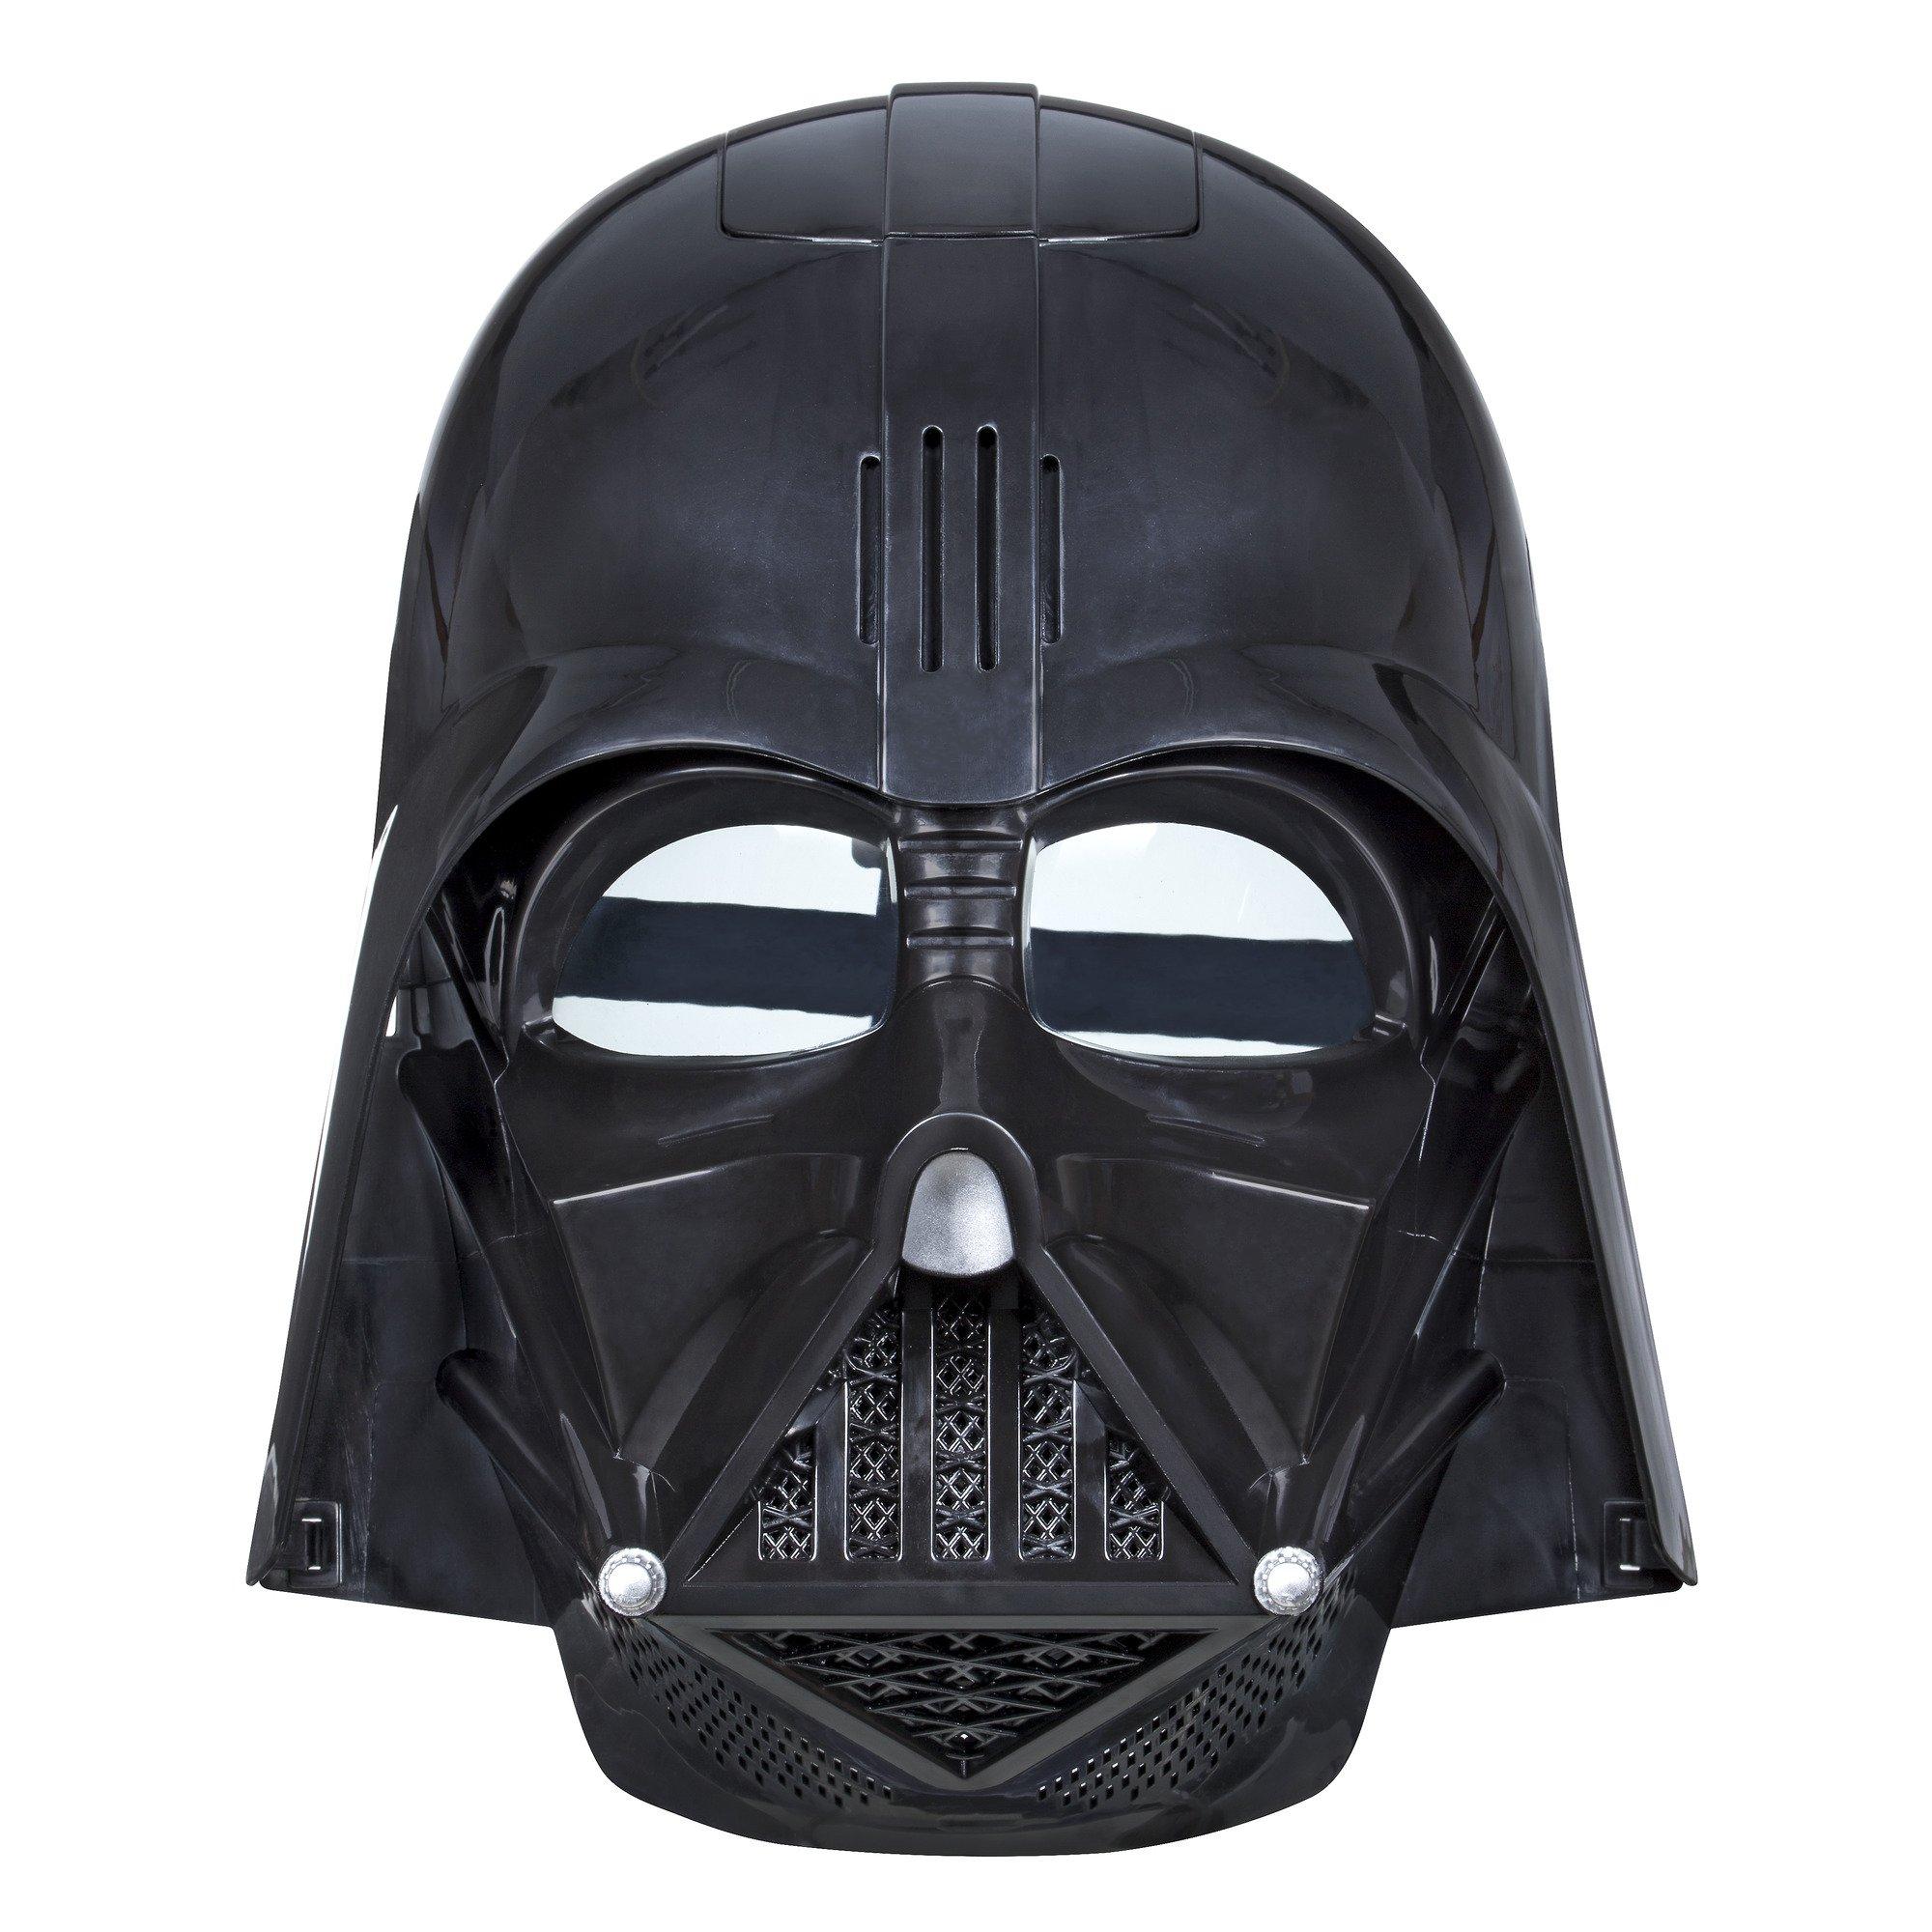 Star Wars: Rogue One Darth Vader Voice Changer Mask by Star Wars